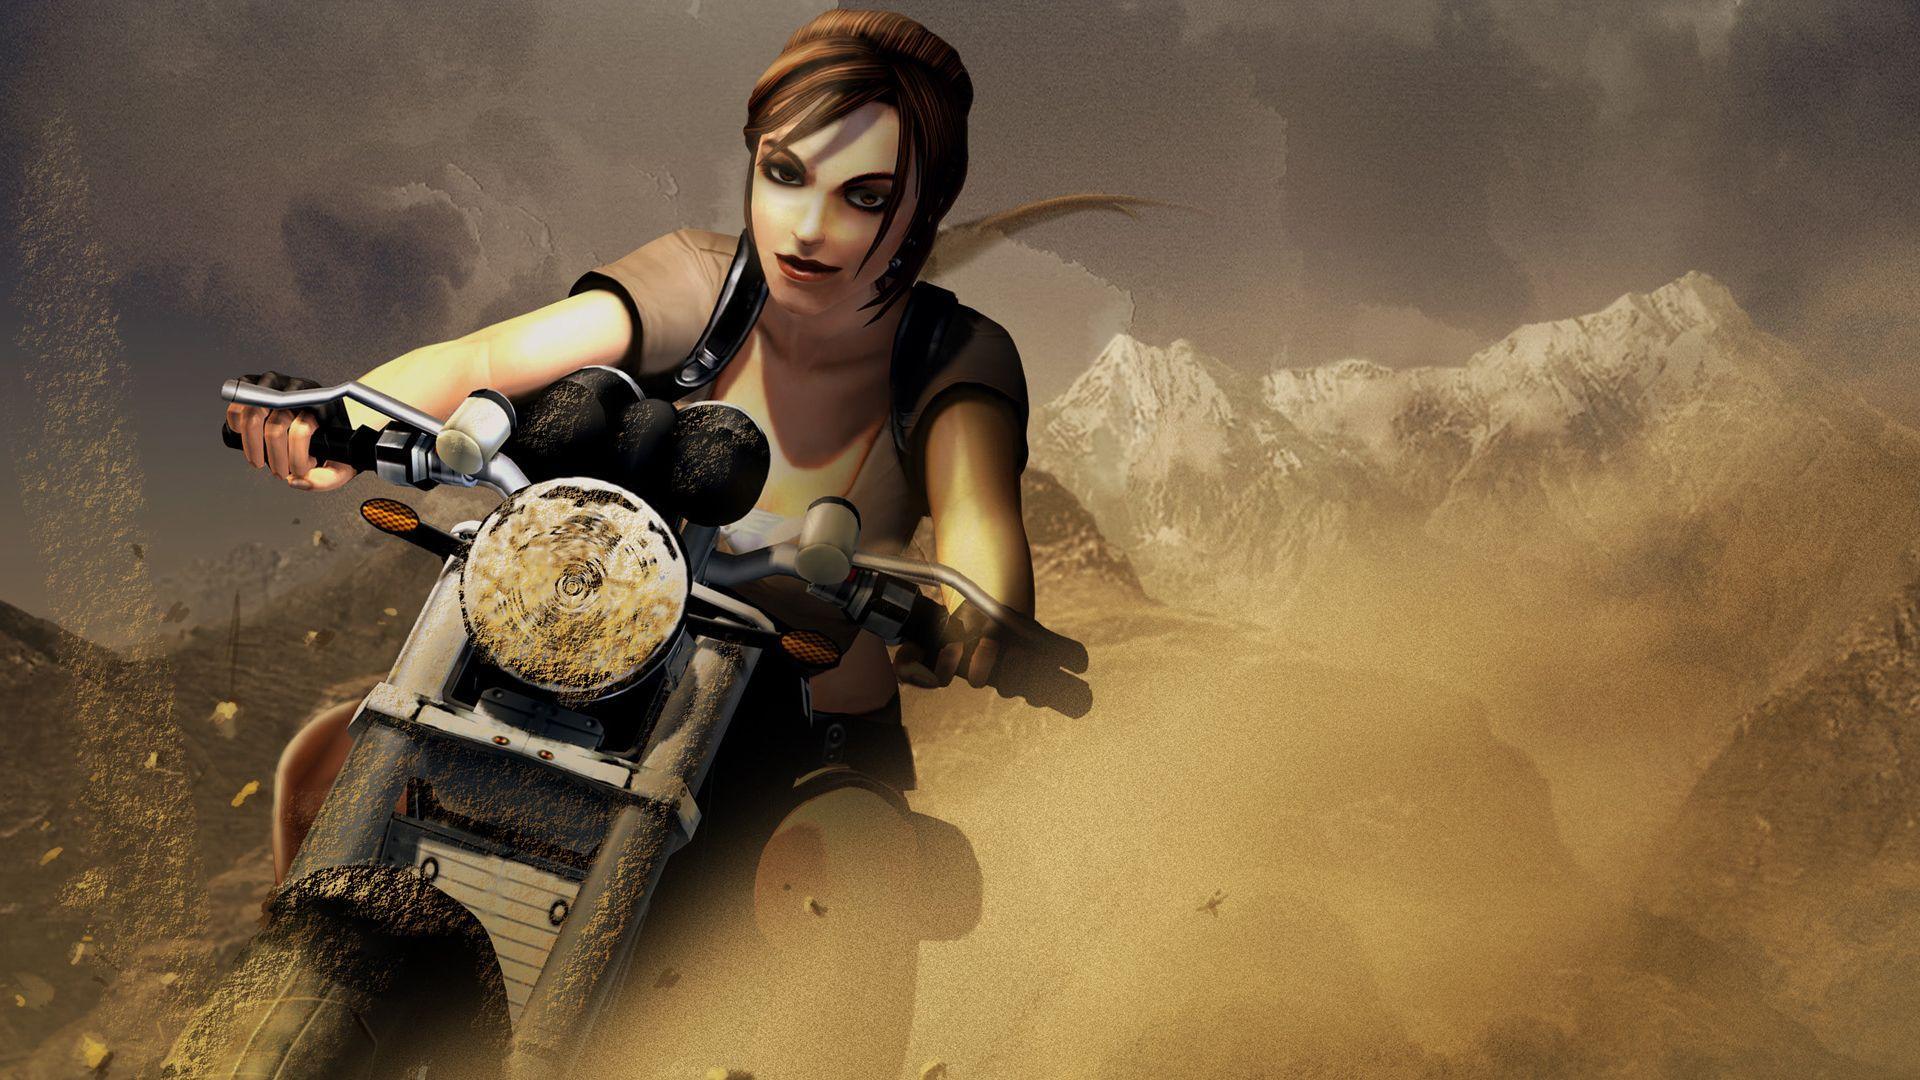 Tomb Raider Legend Wallpapers Top Free Tomb Raider Legend